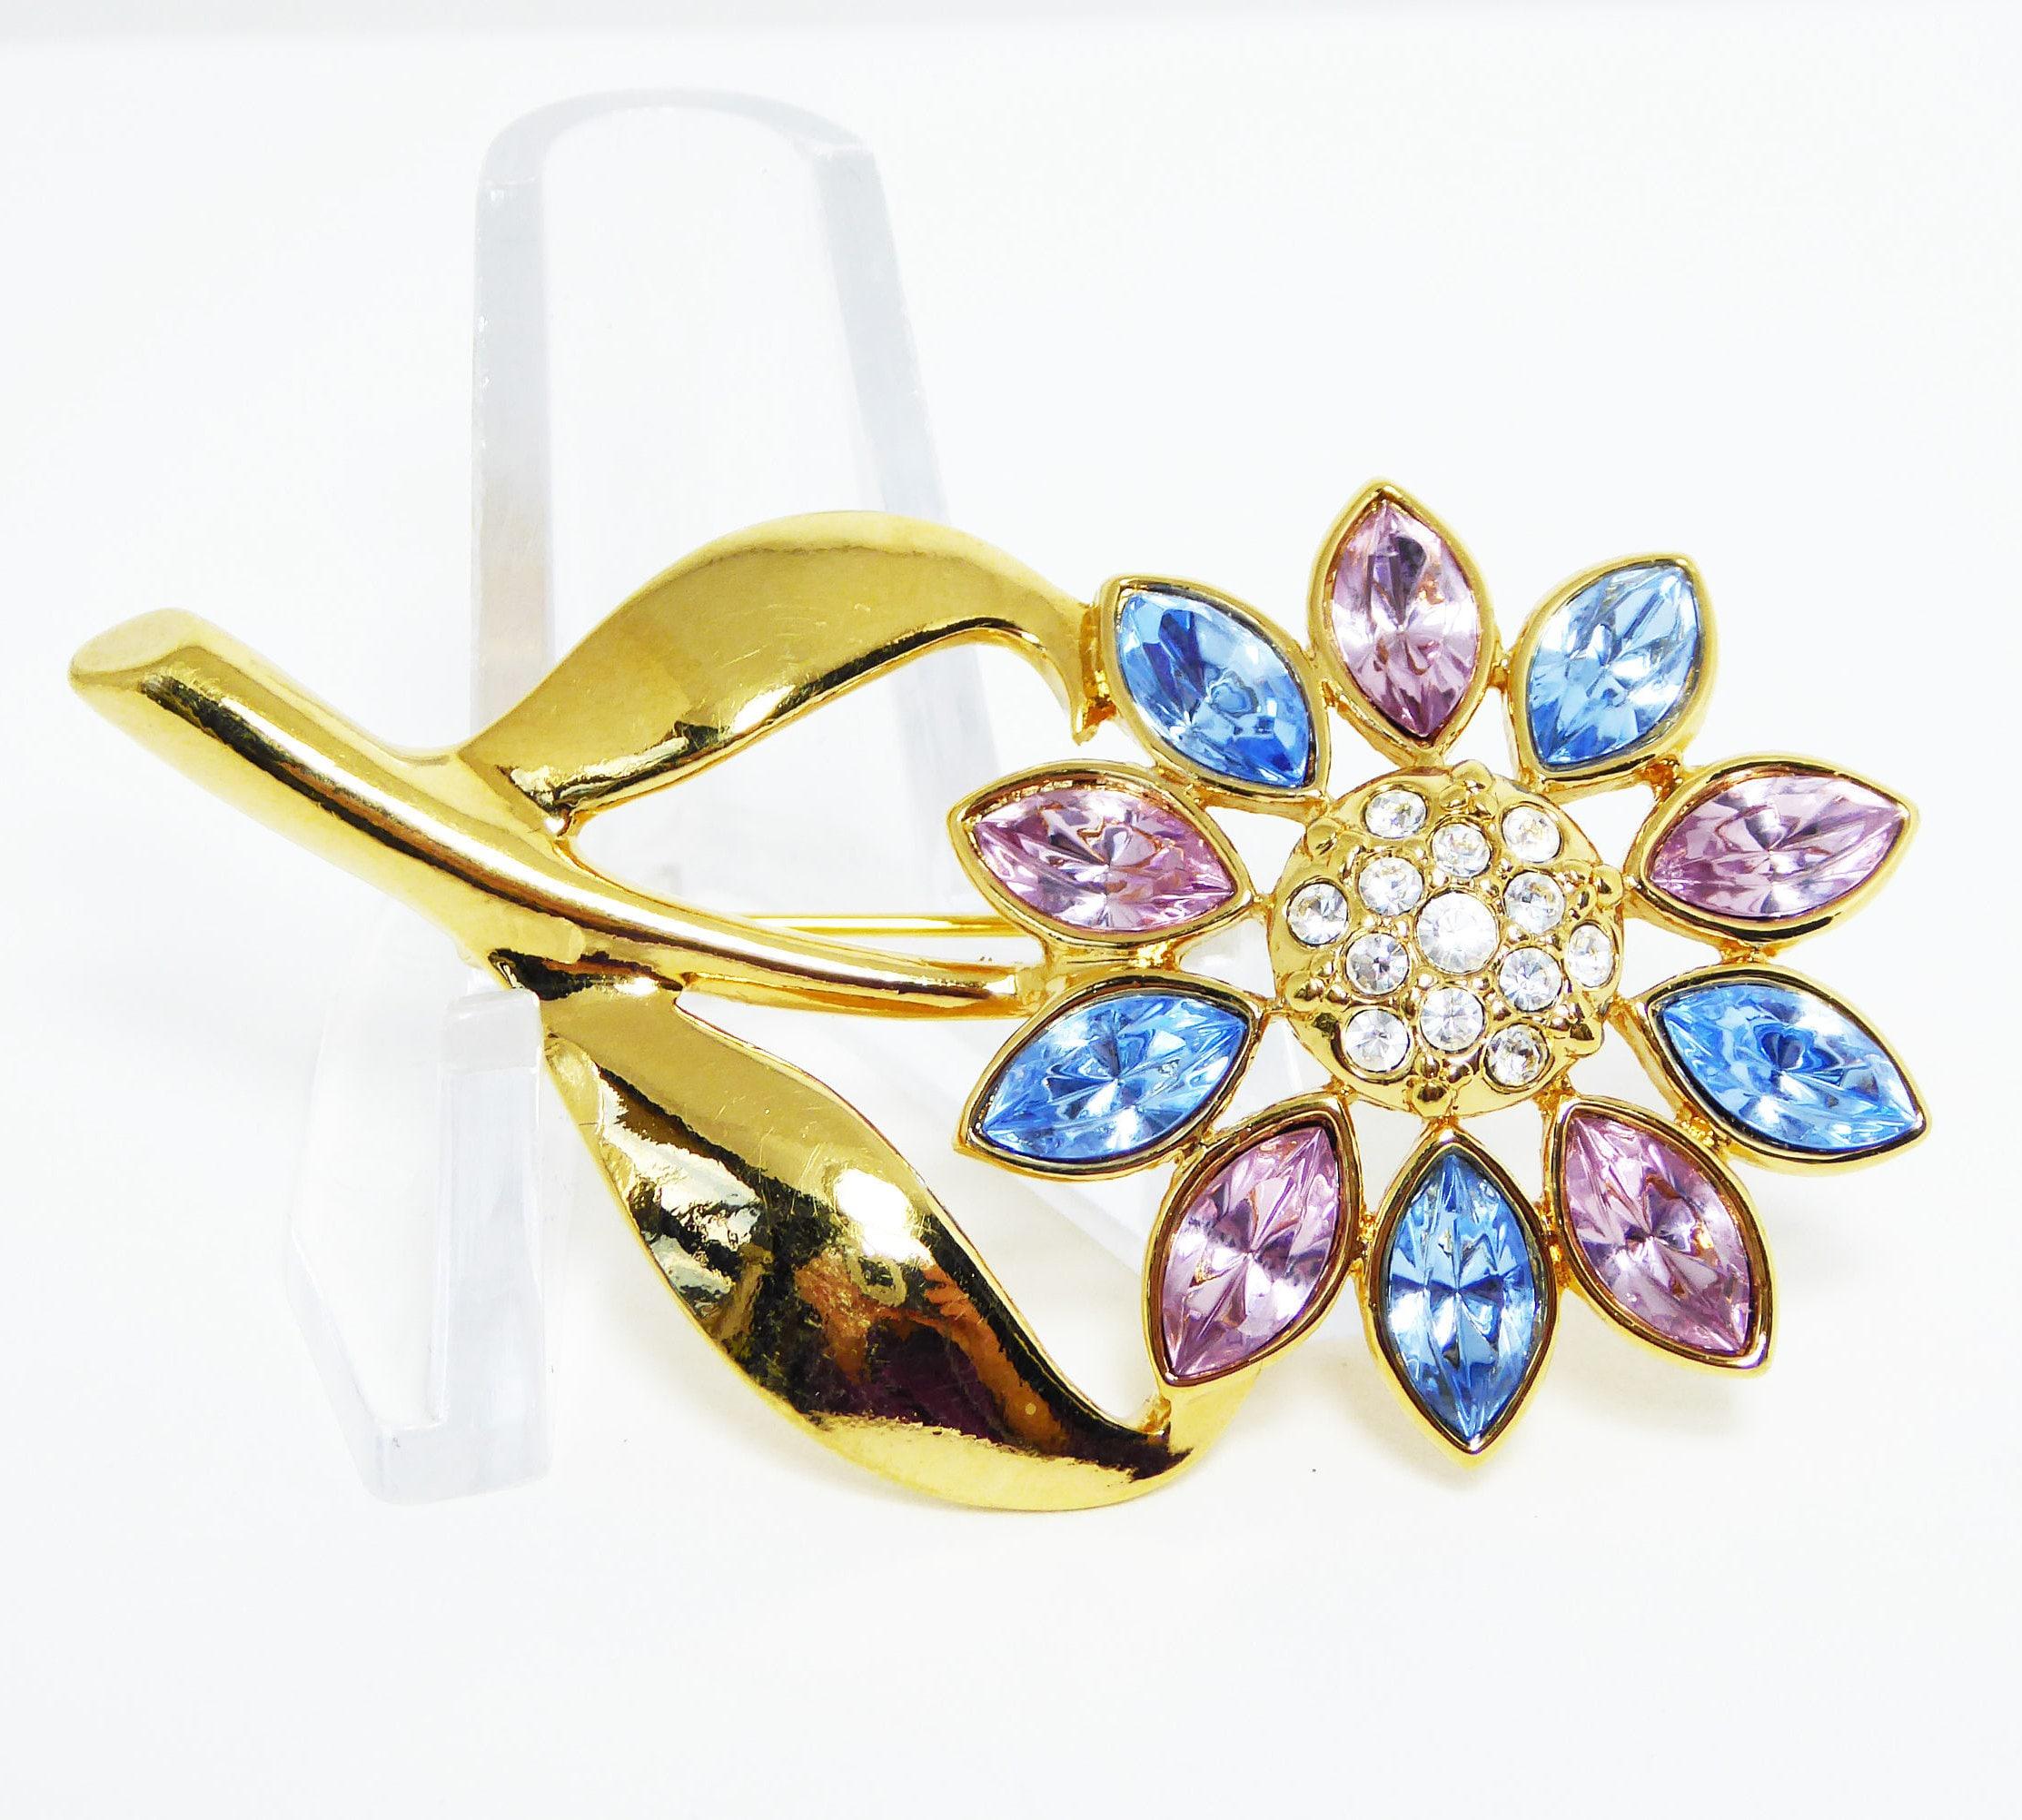 Blue   Pink Rhinestone Flower Pin - Gold Tone Long Stem and Leaves 51e1214191f9